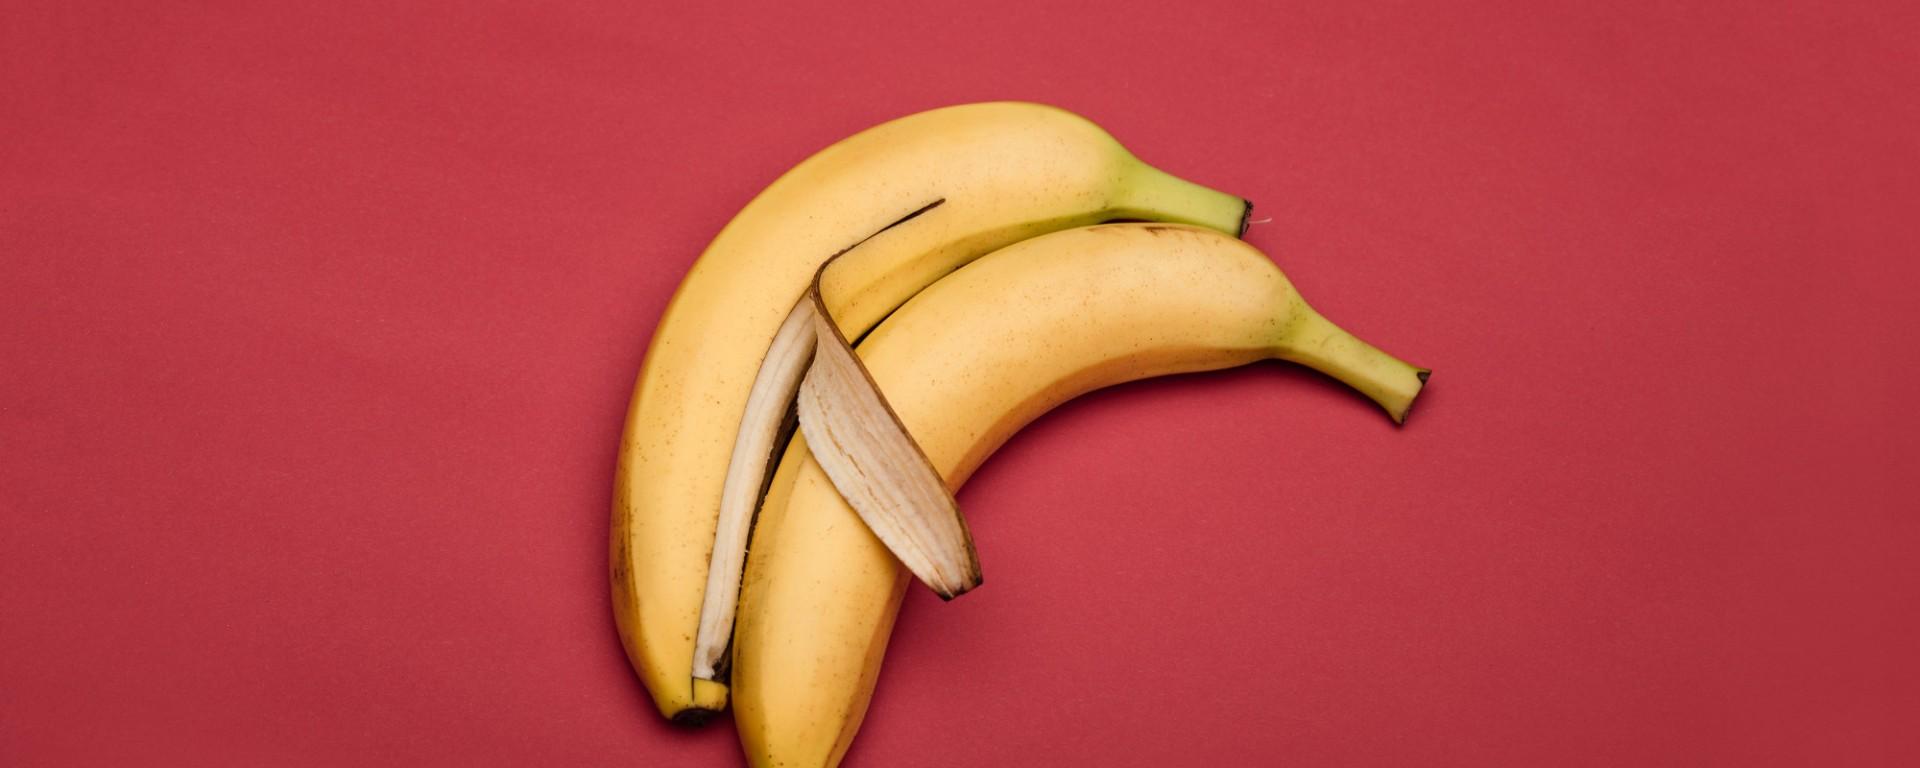 Gay men naughty bananas. Deon Black on Unsplash